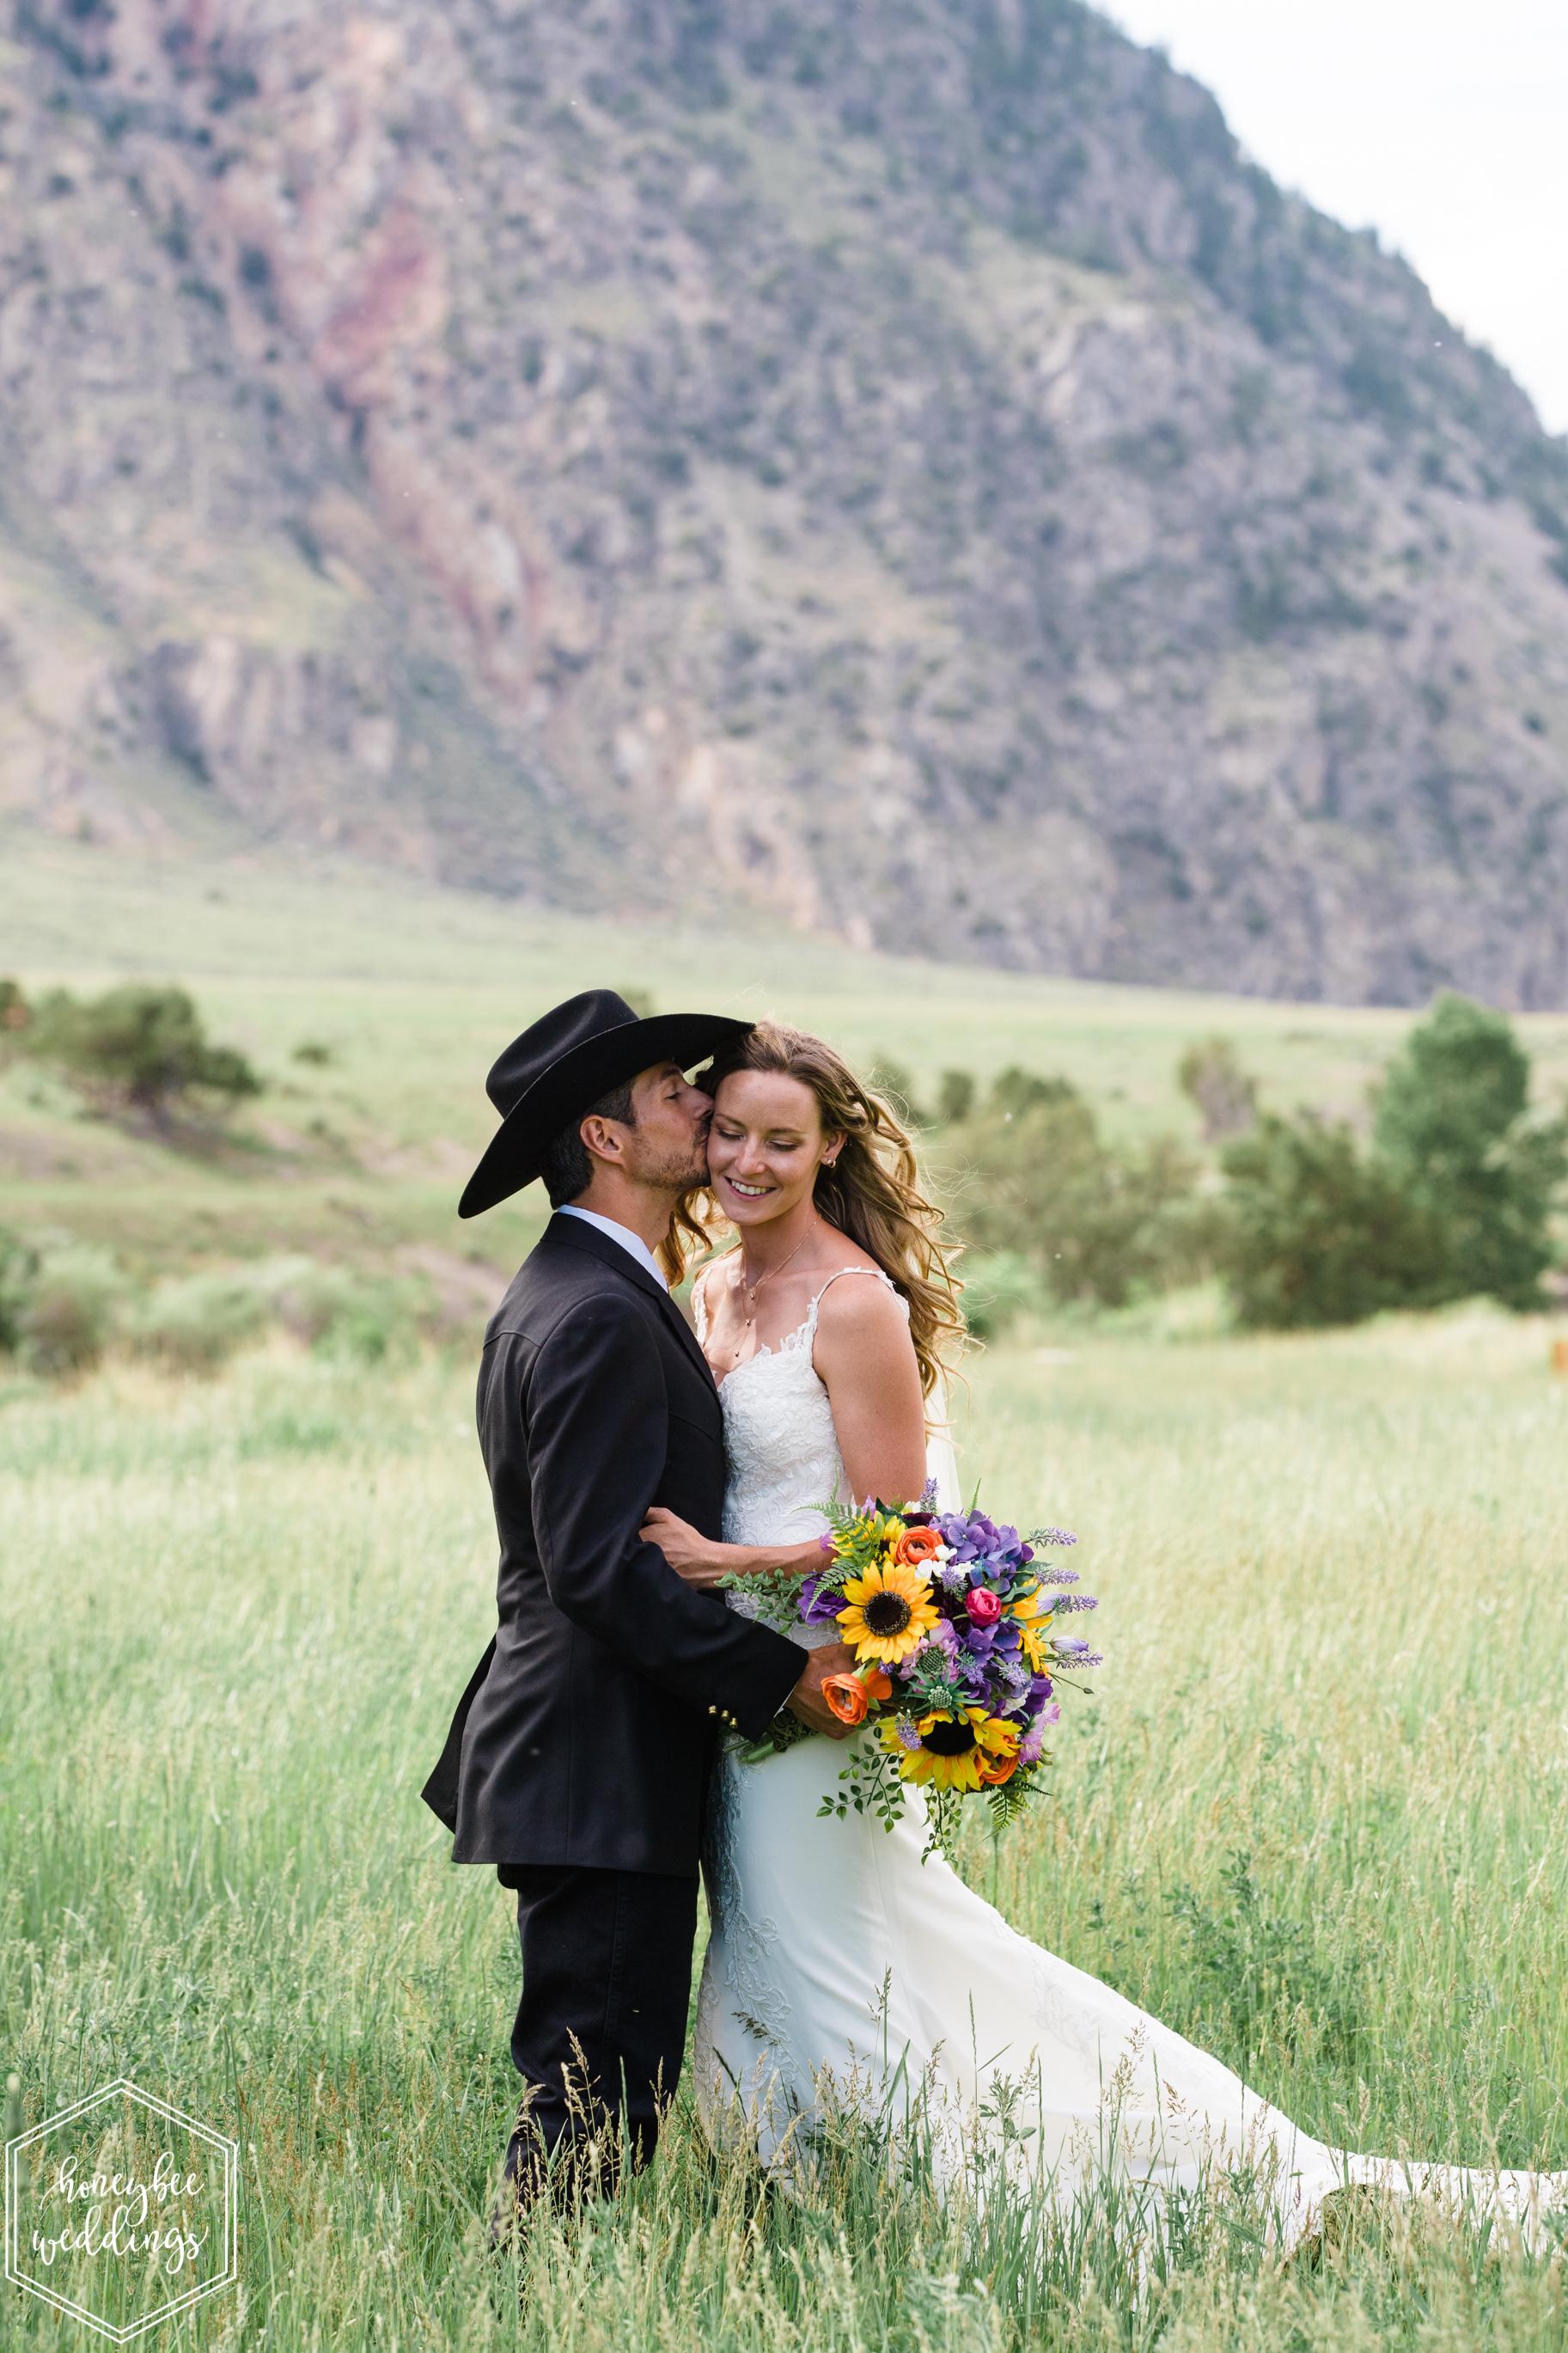 132Yellowstone National Park Wedding_Montana Wedding Photographer_Honeybee Weddings_Shannon & Jonathan_June 29, 2019-1724.jpg